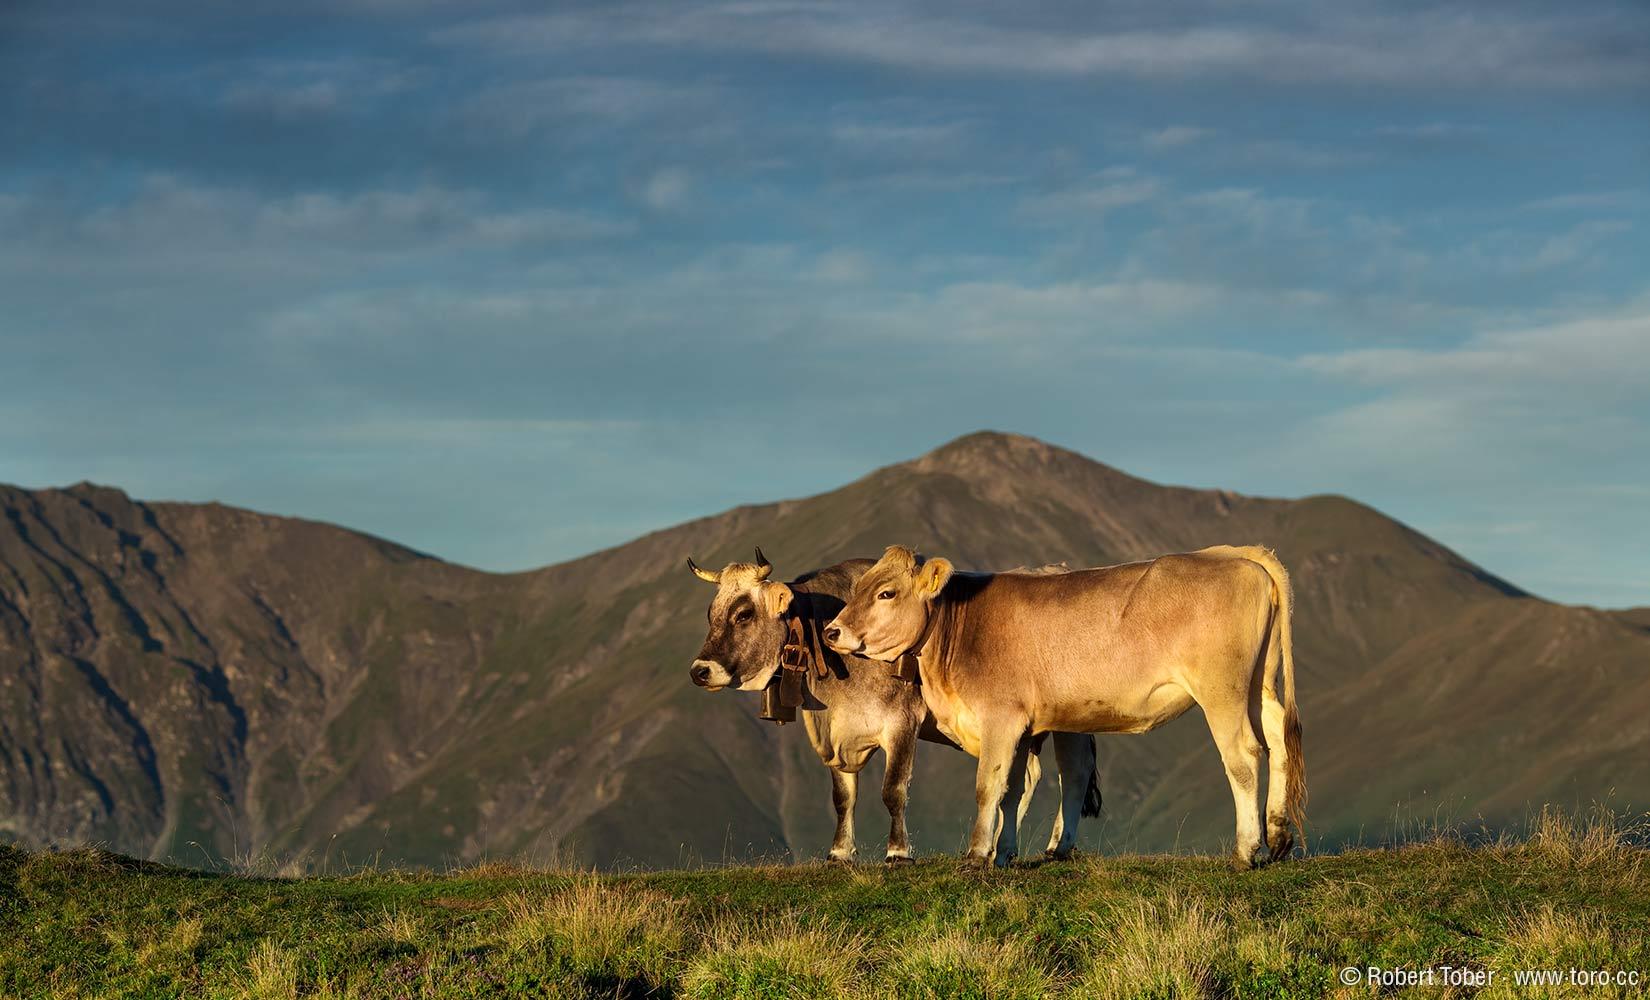 Kuh und Bulle in den Alpen @ Robert Tober